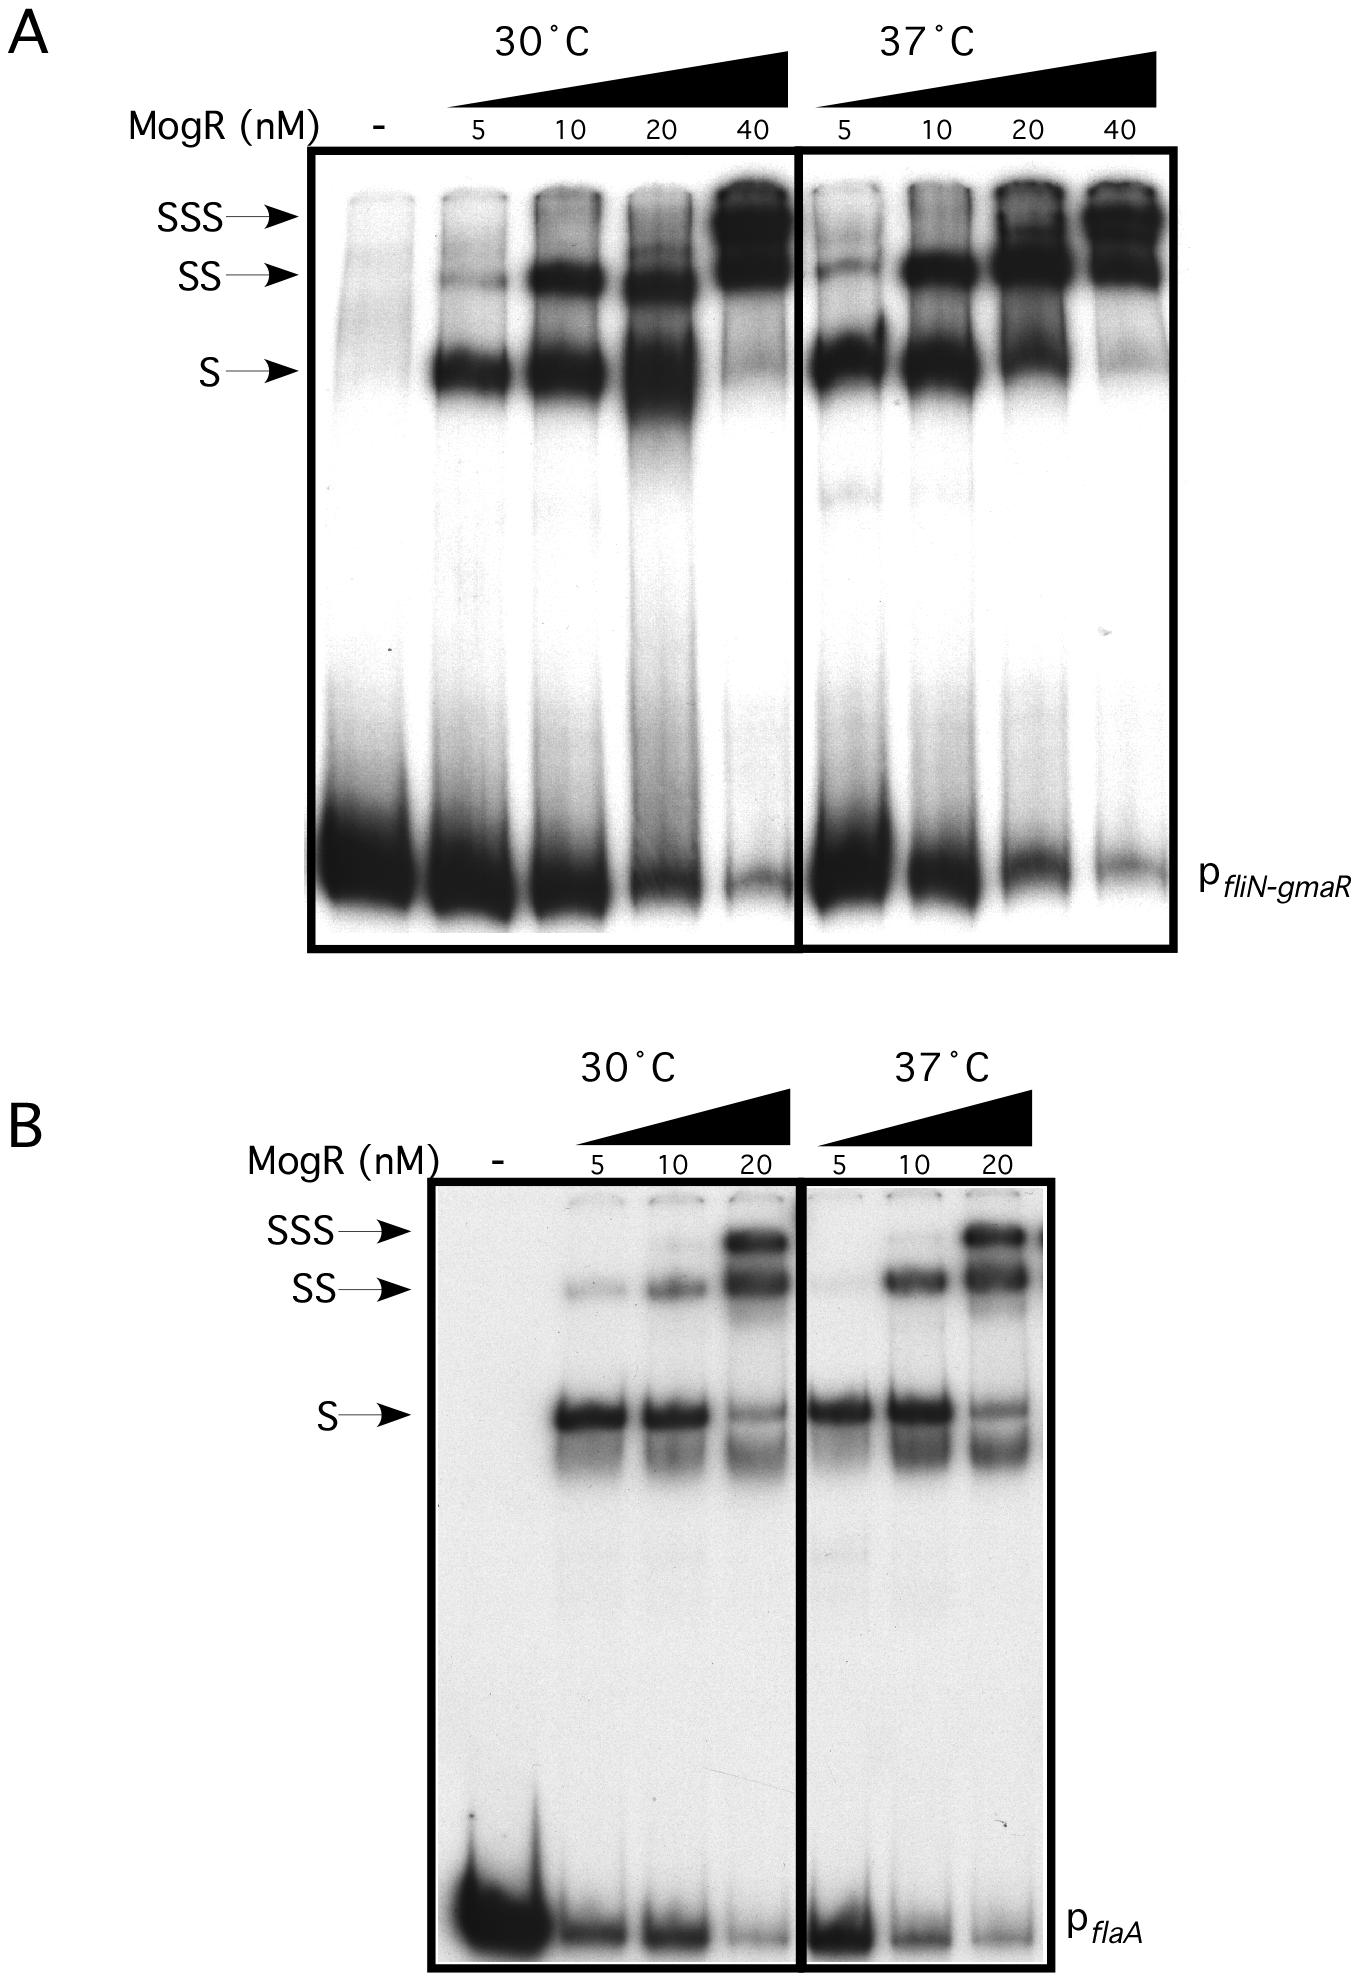 MogR binds to flagellar gene promoter region DNA in a temperature-independent manner.